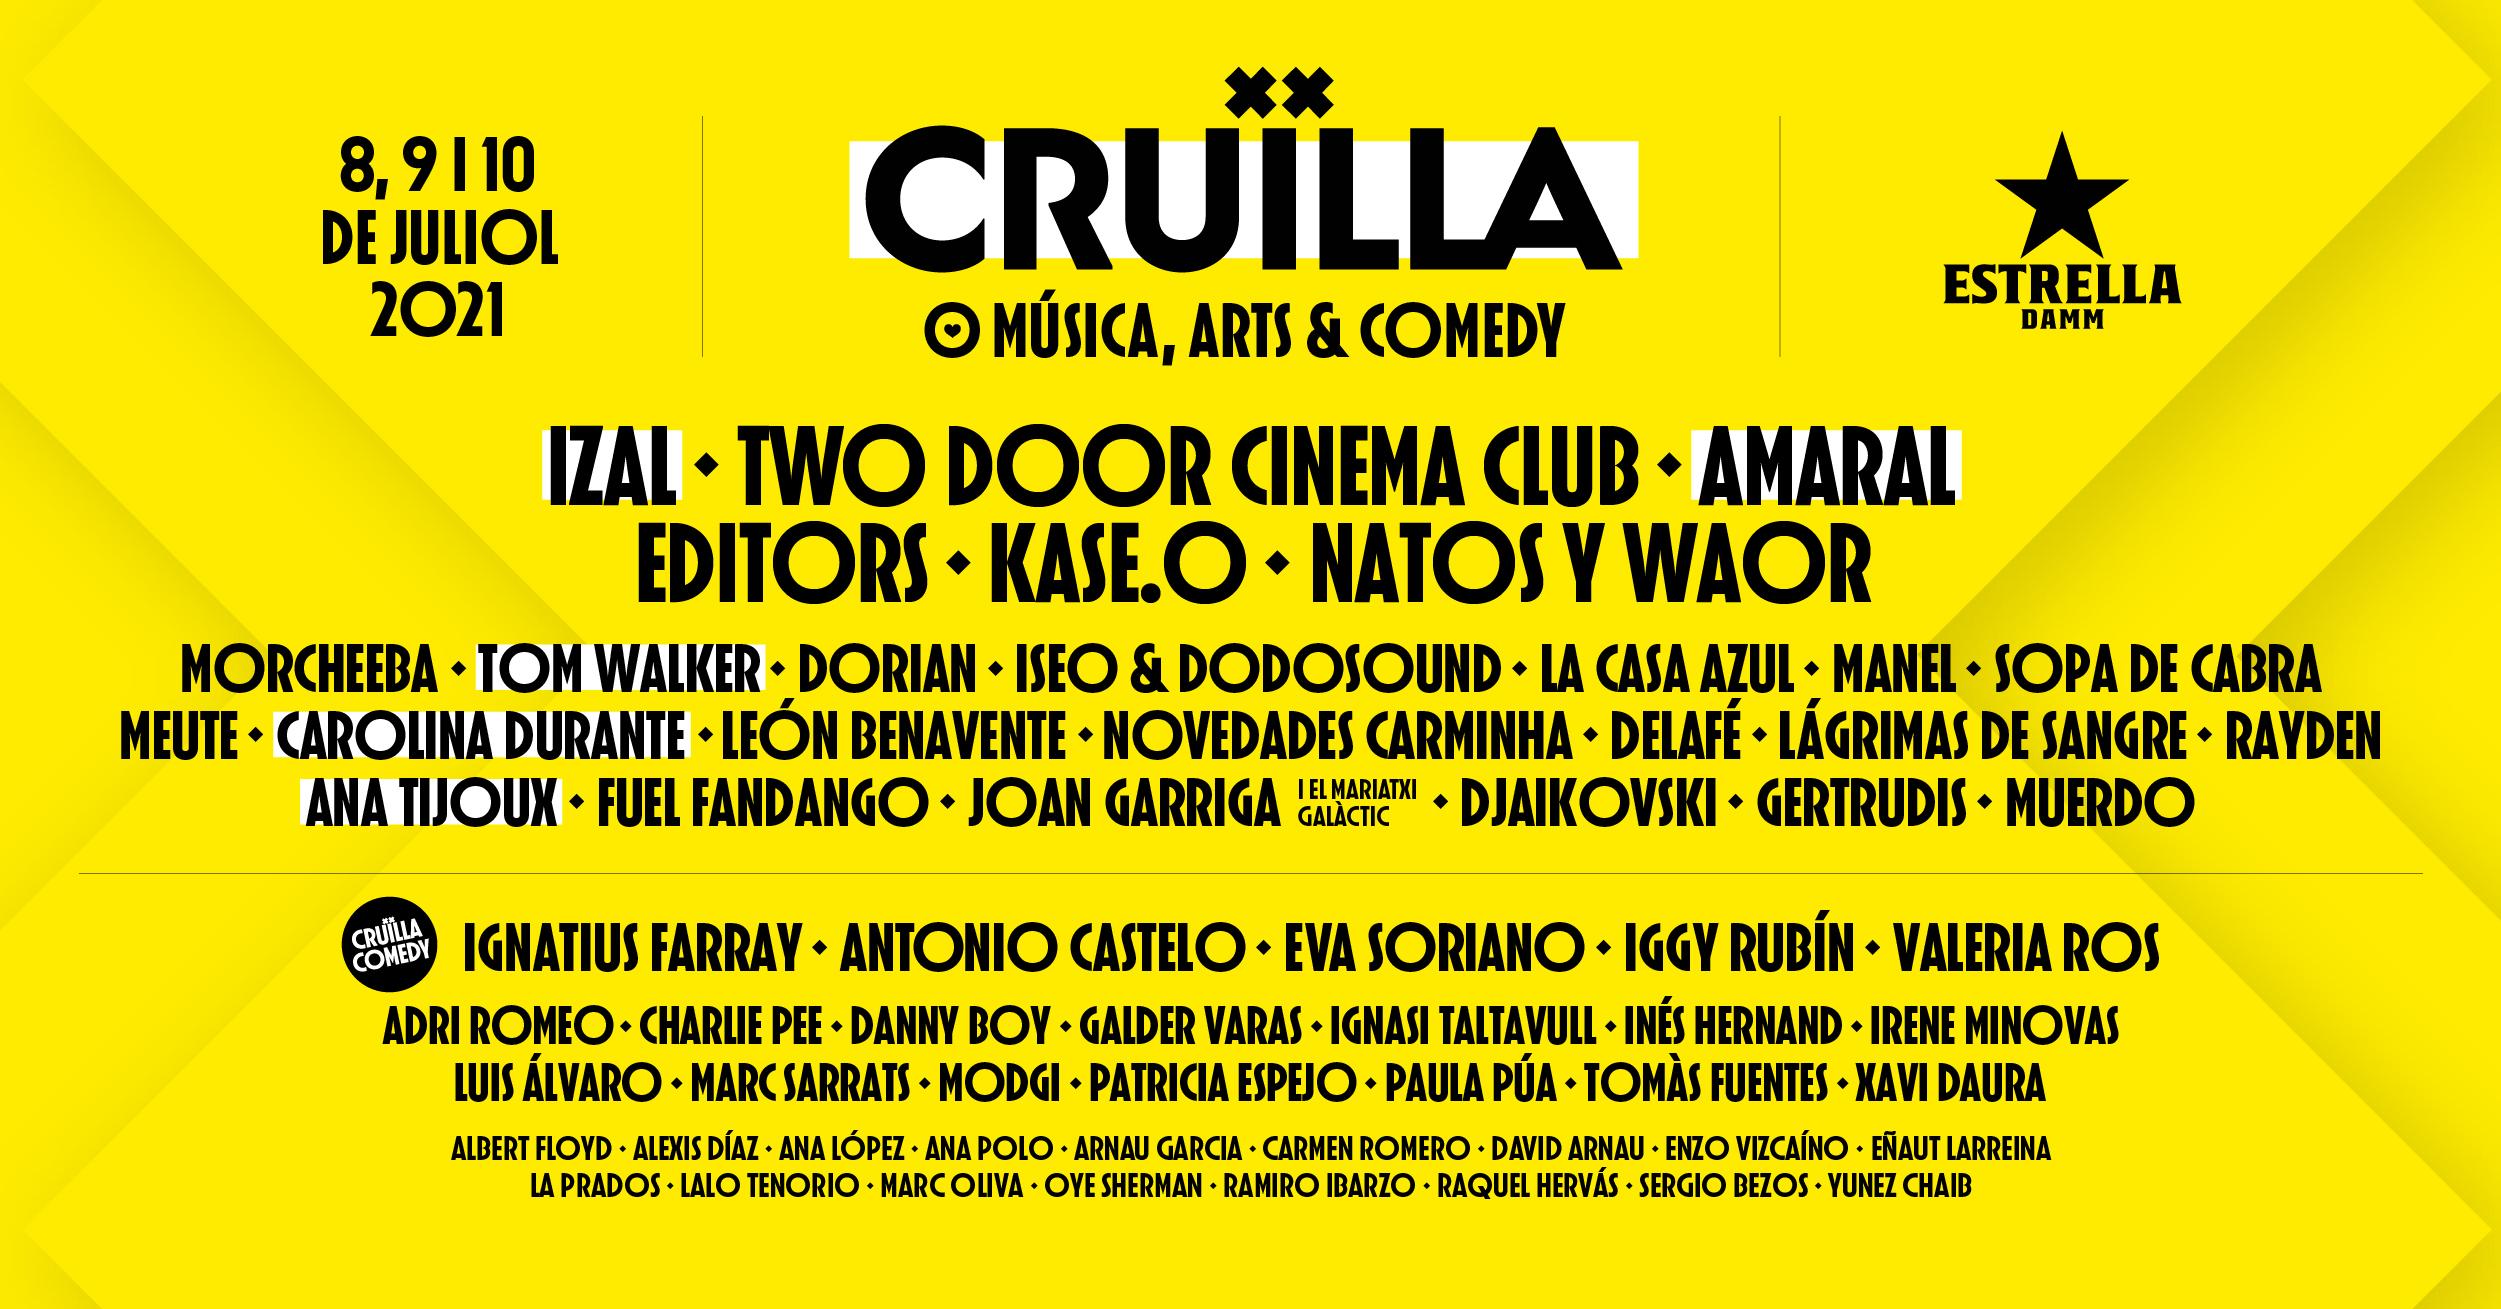 Cruilla Festival 2020 - Página 15 E0nWNH6XMAUZ9G1?format=jpg&name=4096x4096